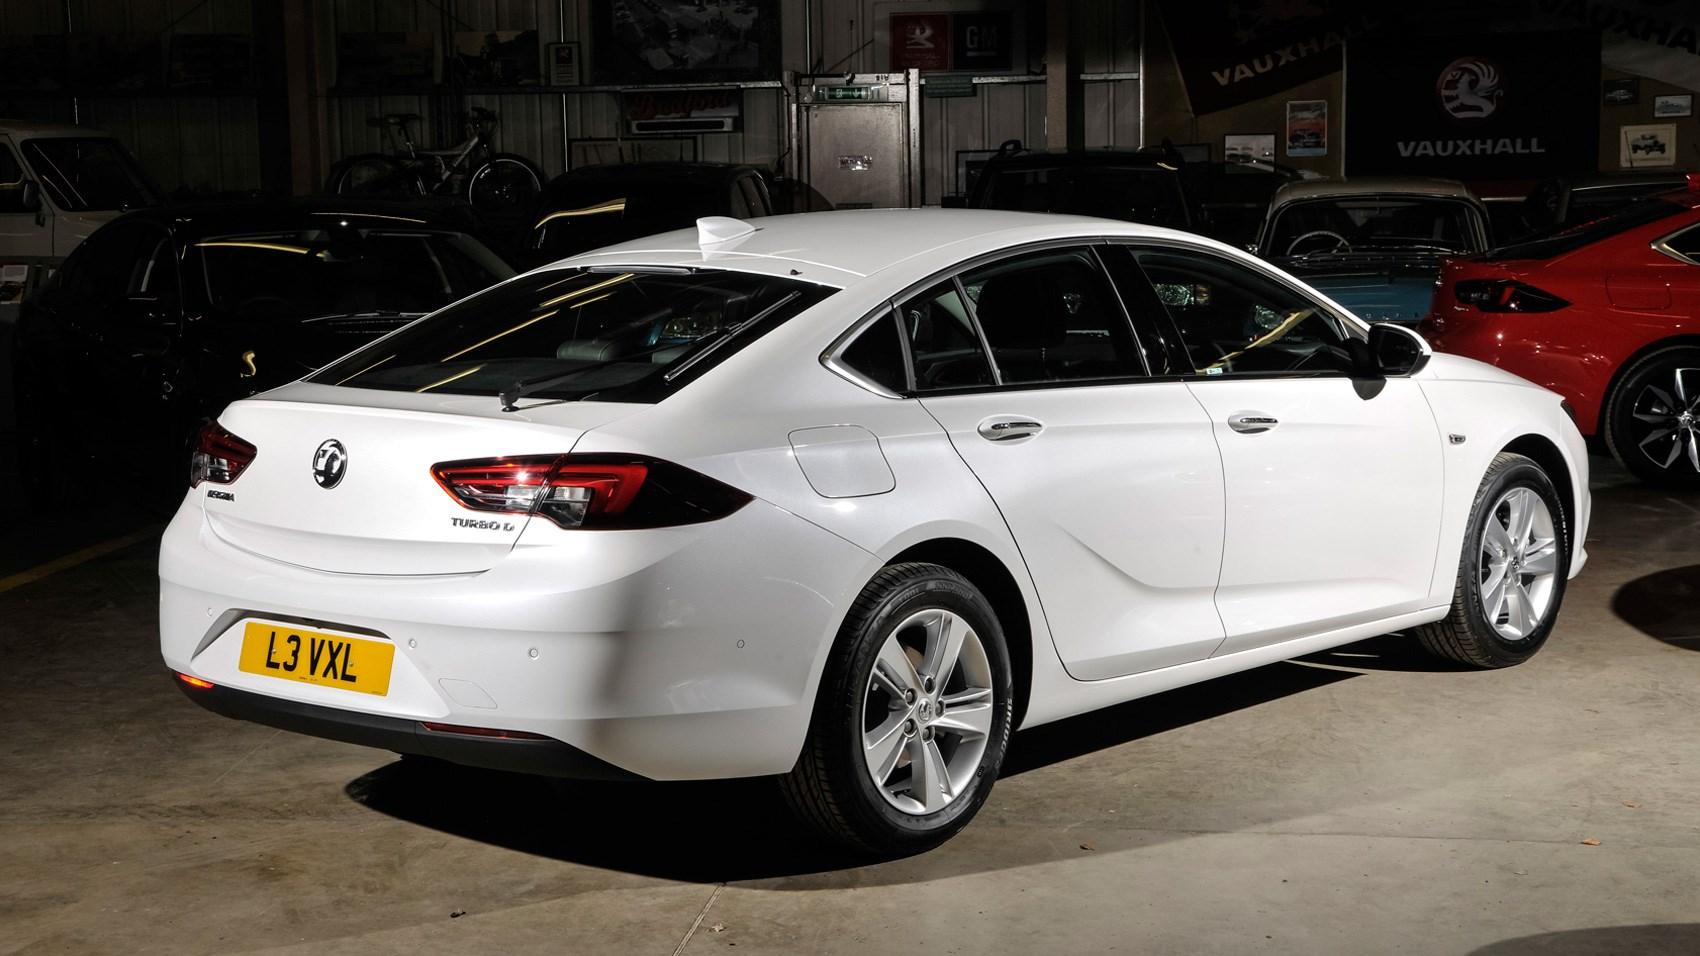 Vauxhall Lease Car Deals